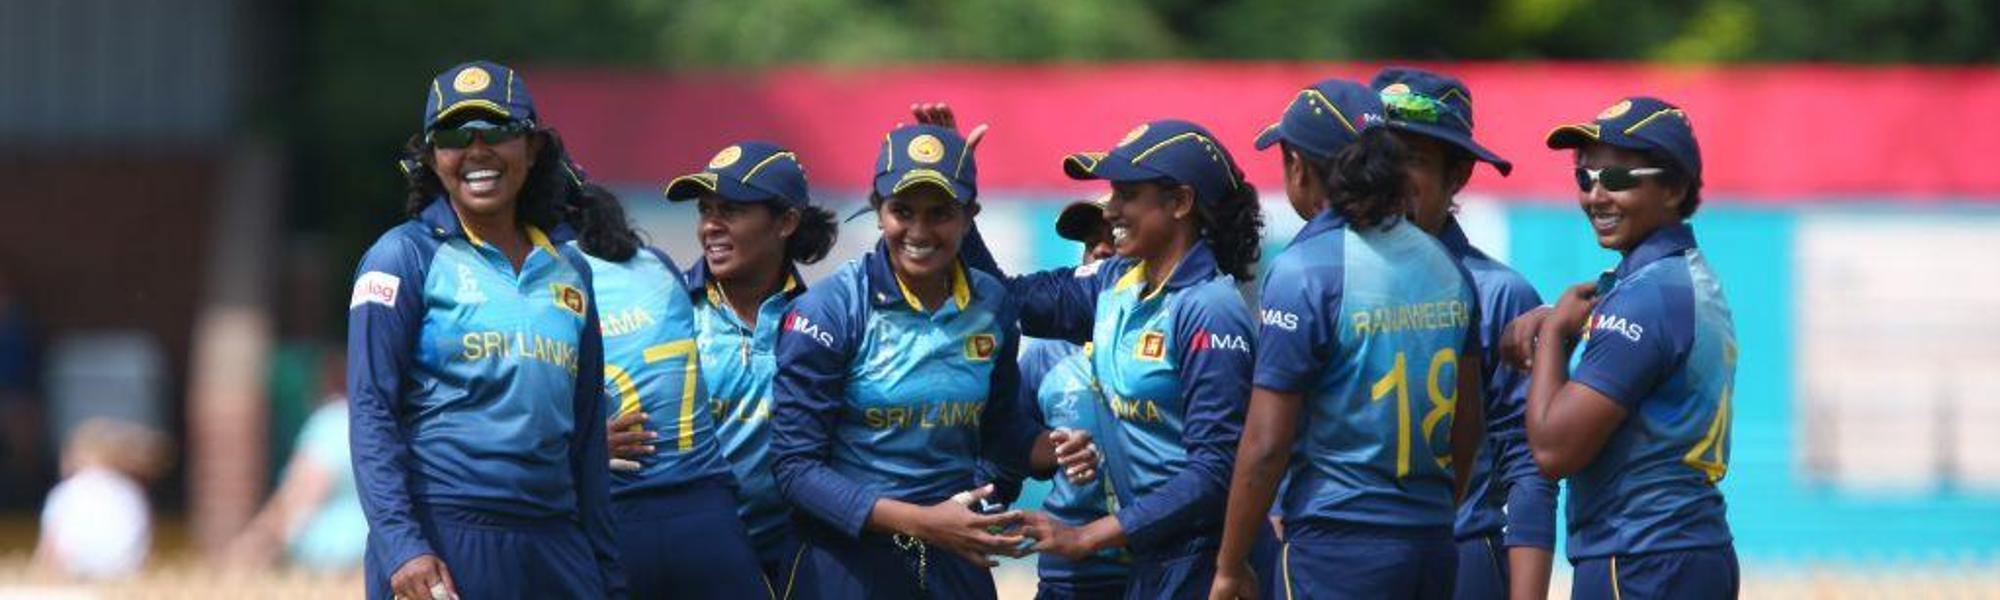 Sri Lanka women